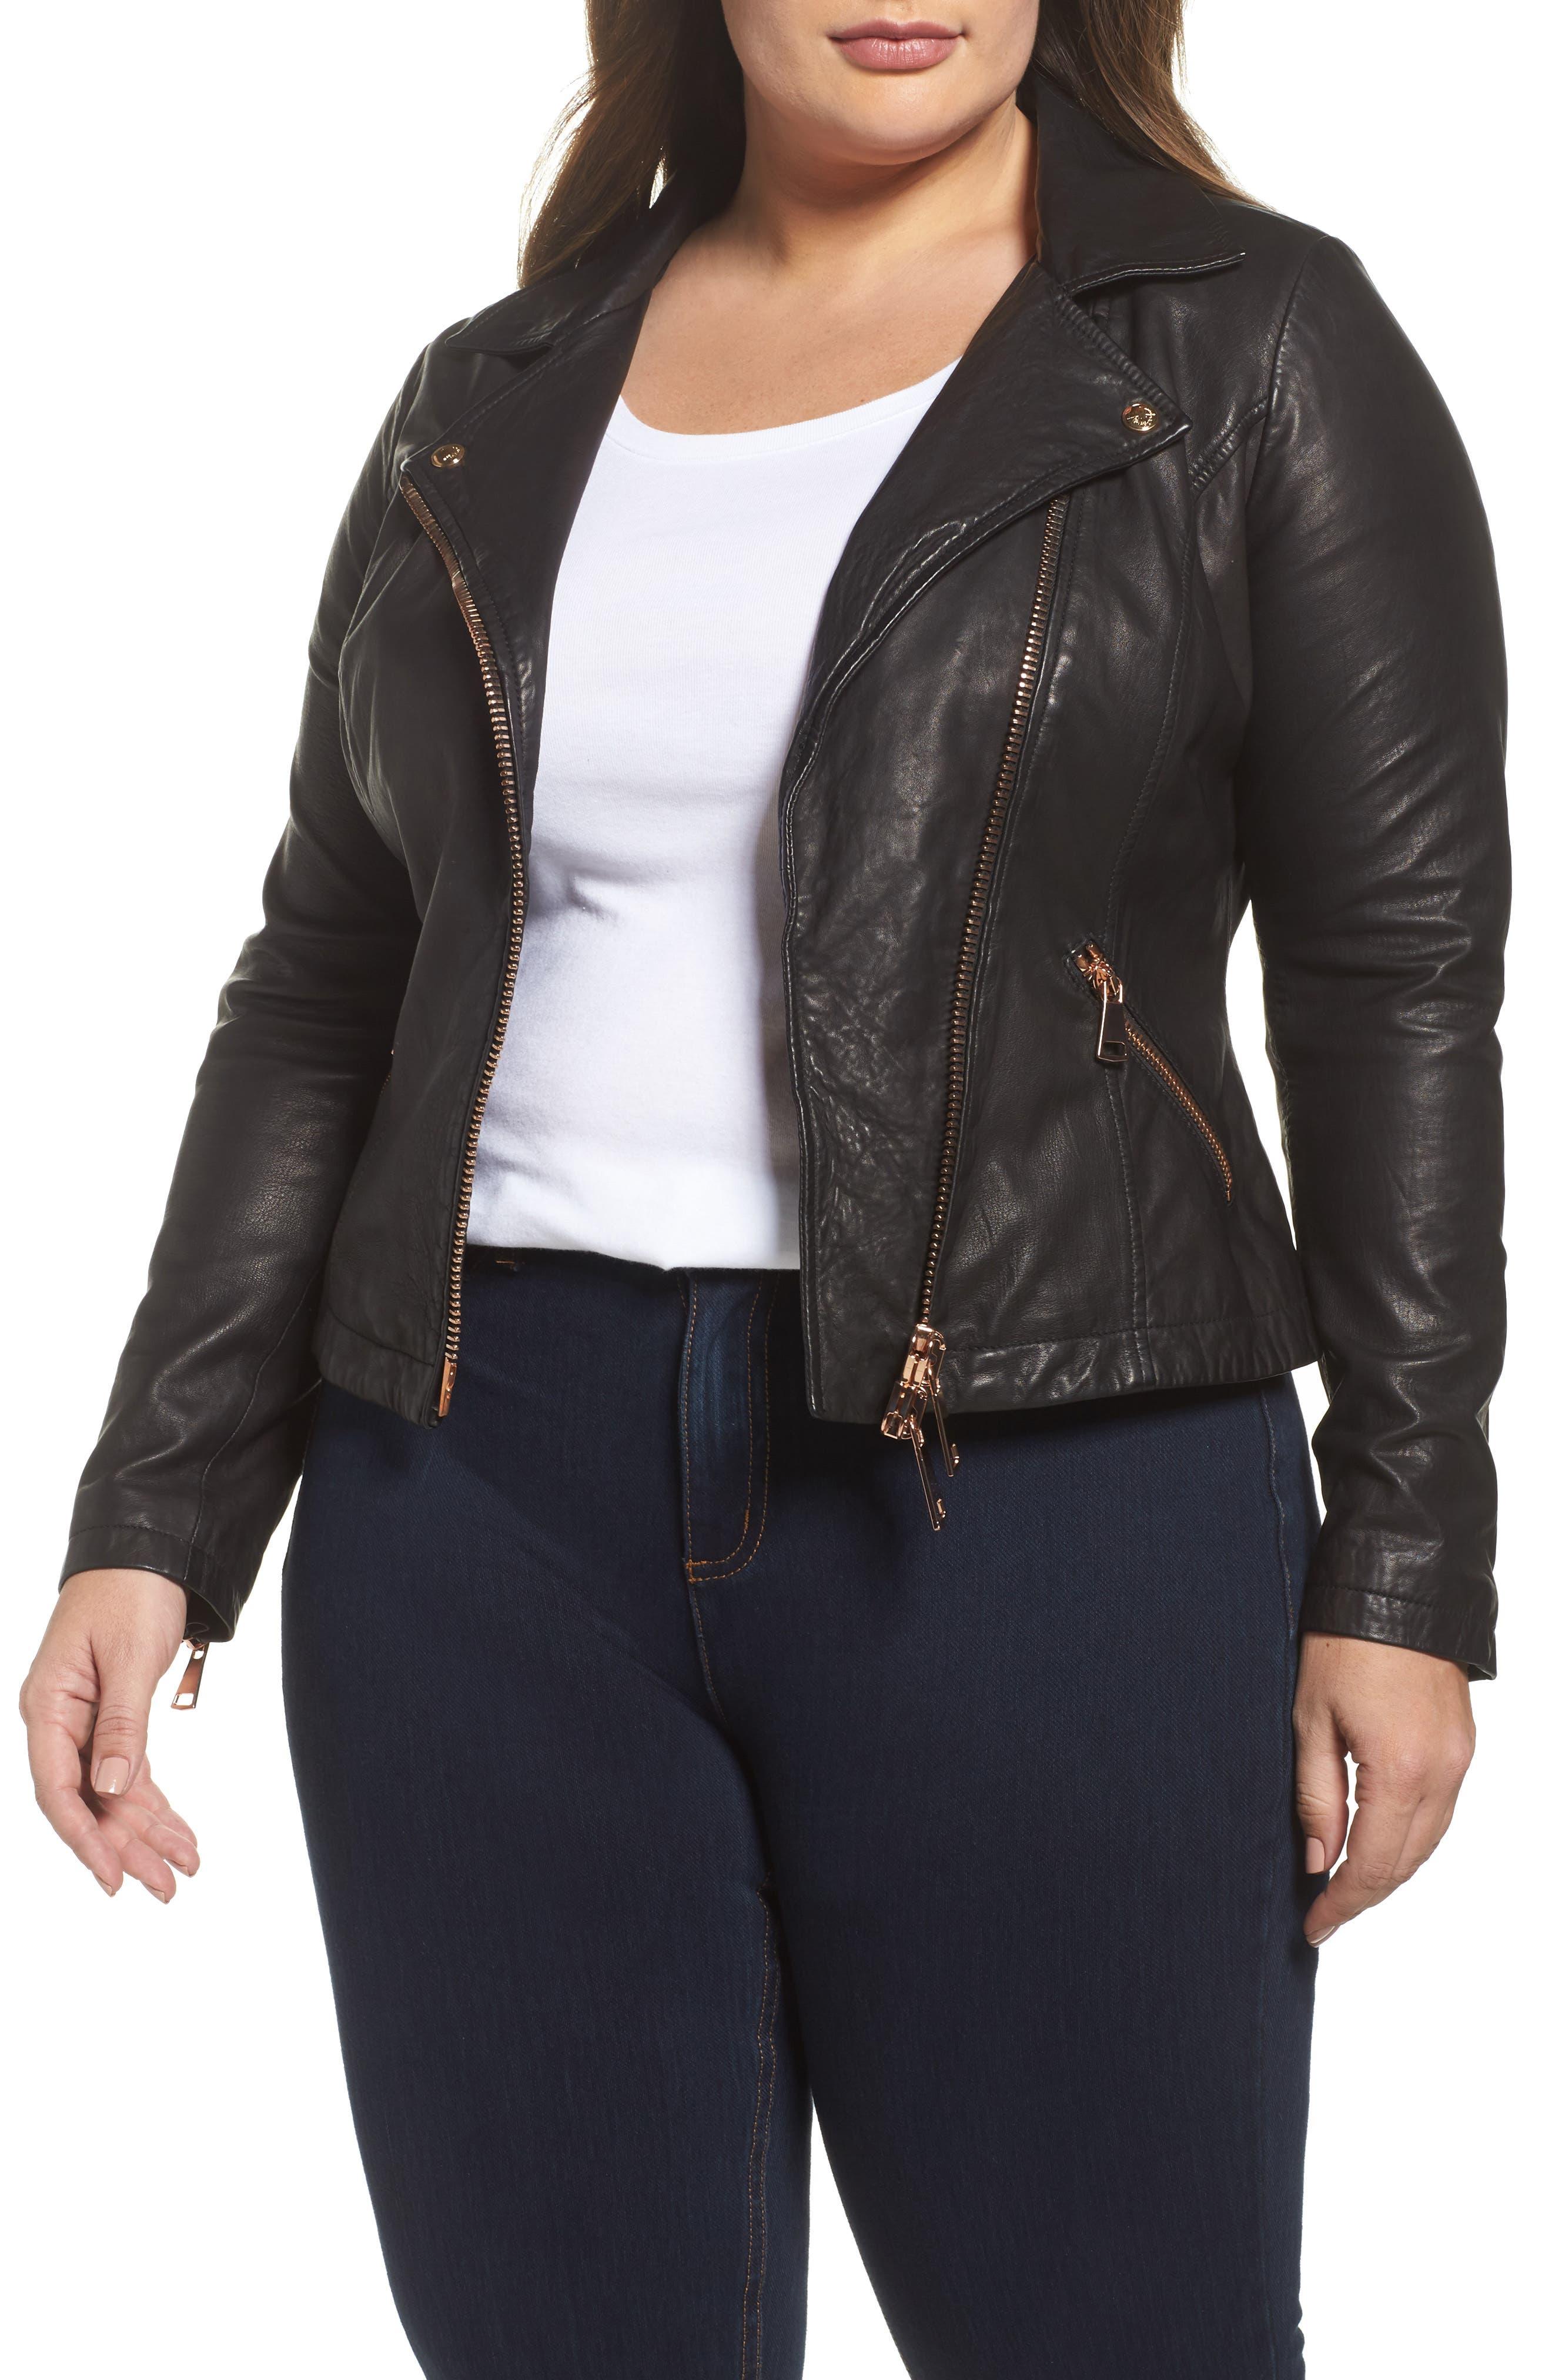 Ebanista Leather Biker Jacket,                         Main,                         color, 001